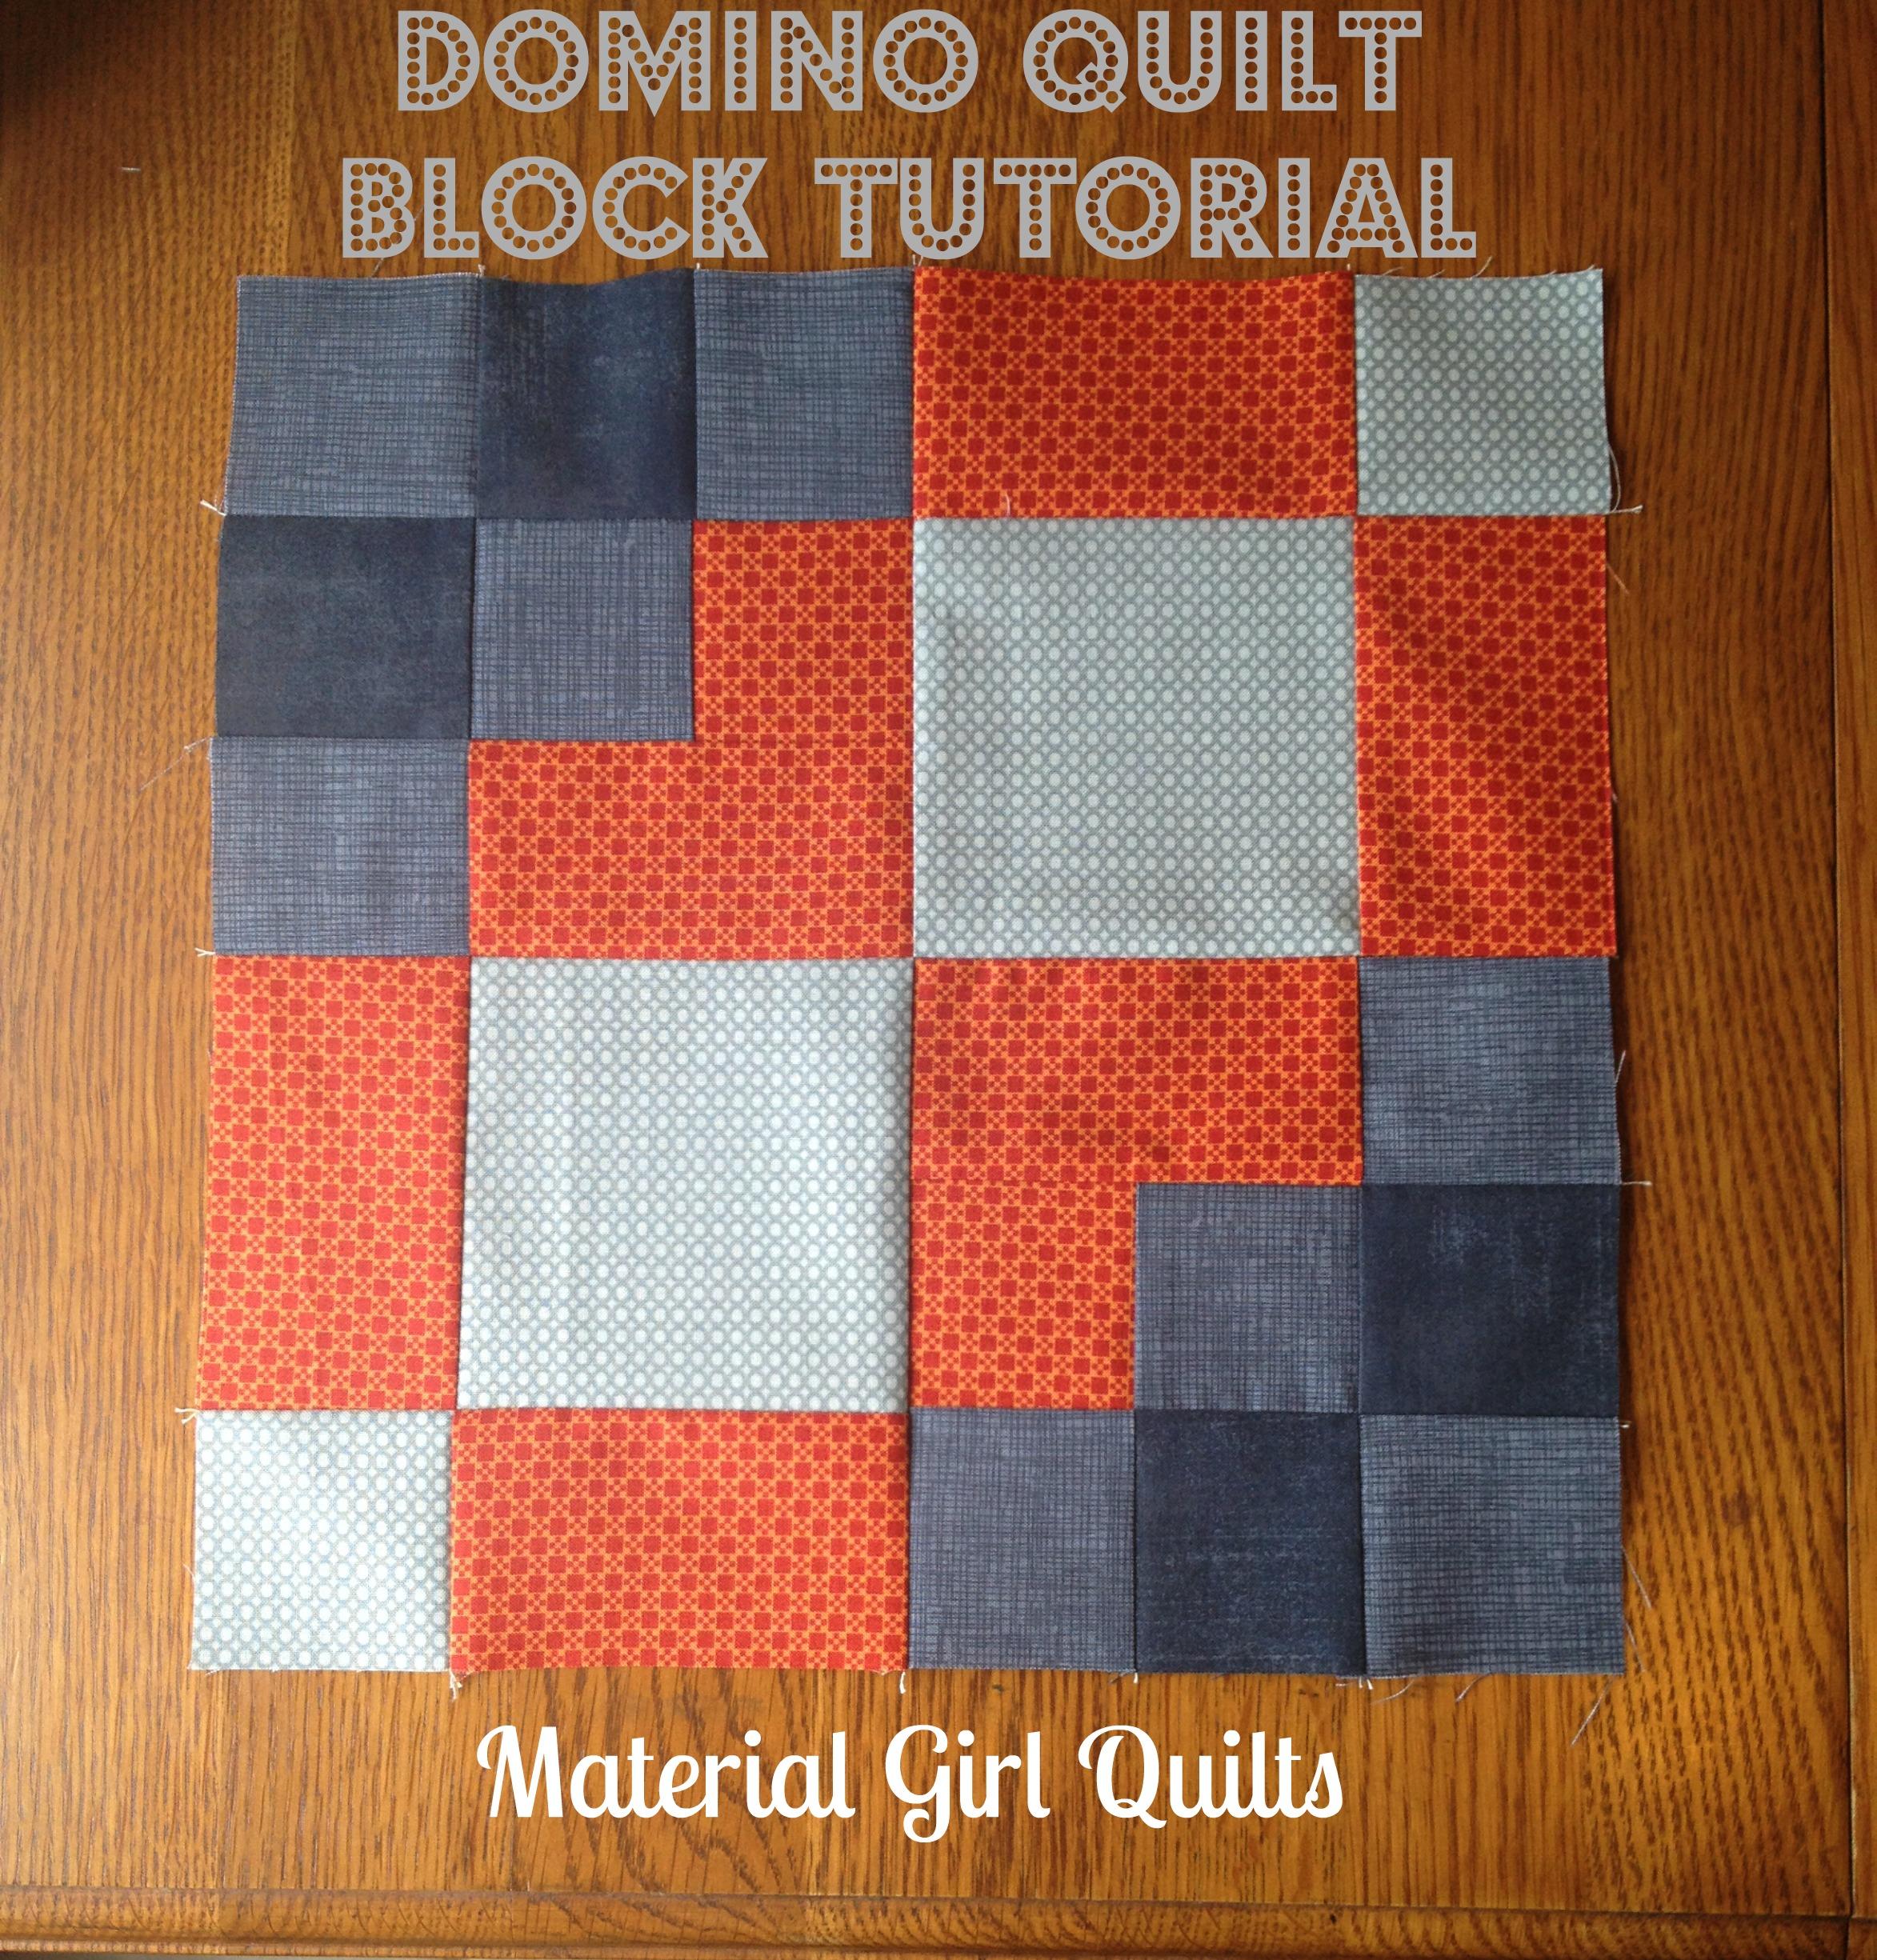 domino-quilt-block-tutorial.jpg